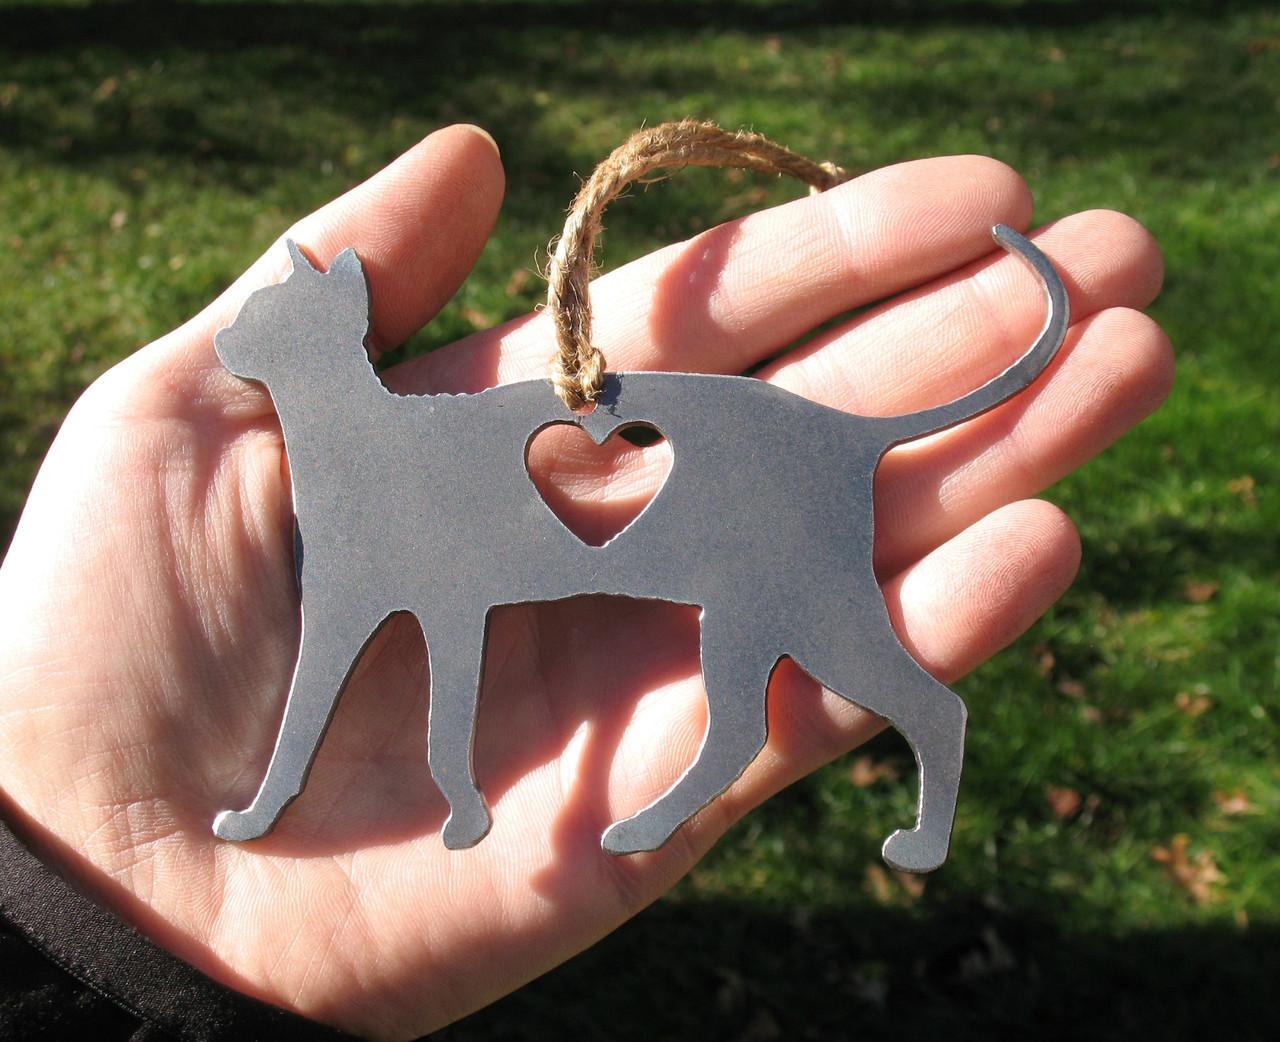 Sphynx Cat Memorial - Cat Loss Gift - Pet Loss Cat Sympathy Remembrance Gift - Metal Cat Christmas Ornament - Cat Lover